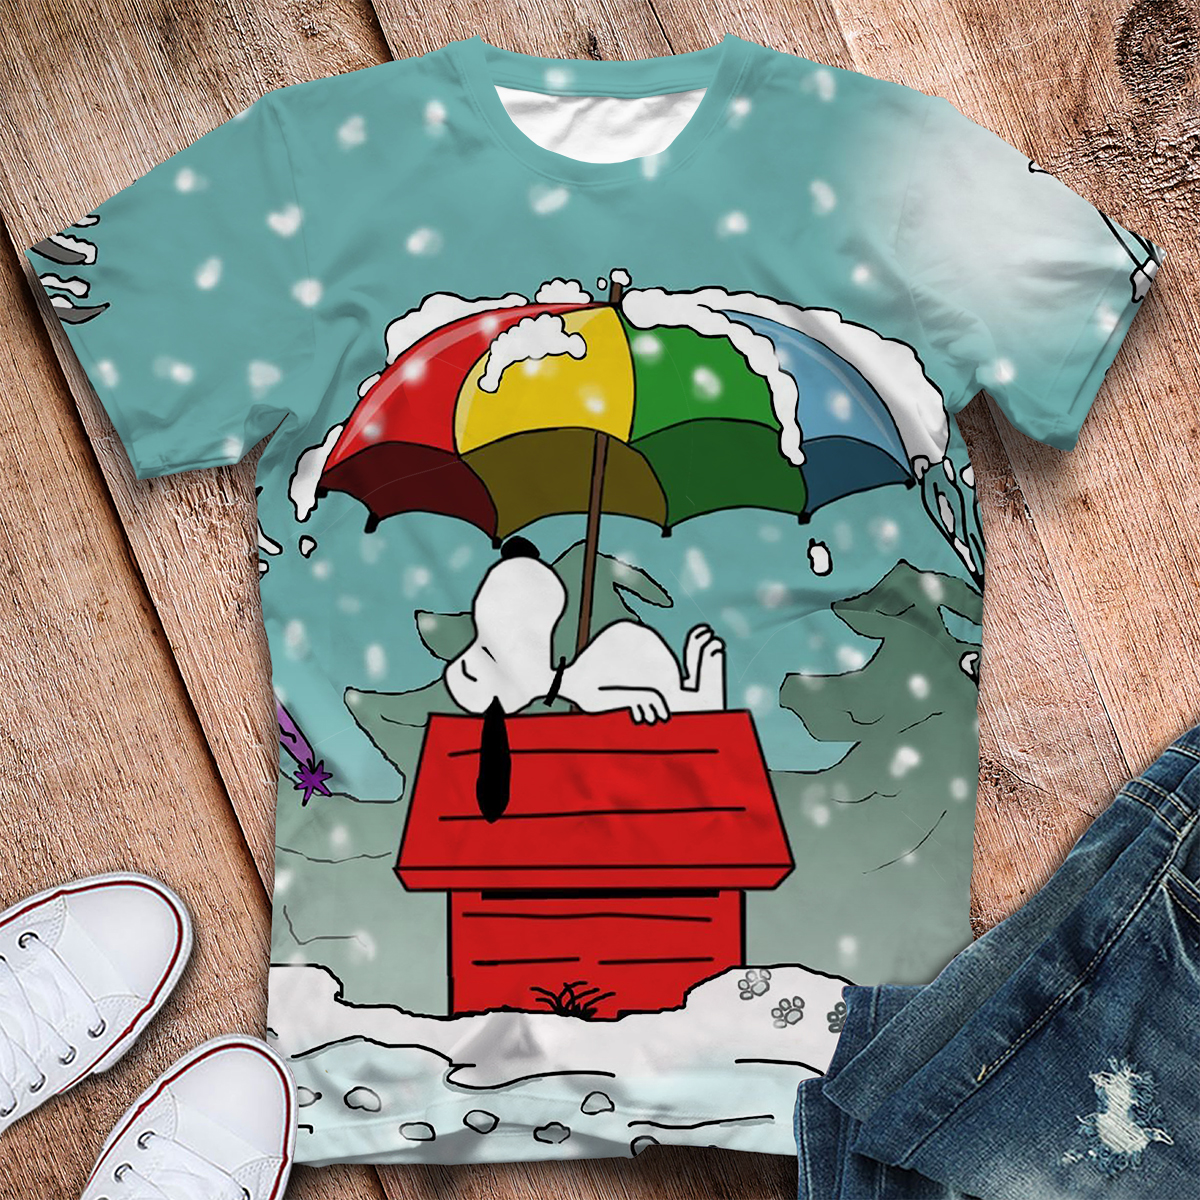 New 2019 Summer Tees Cute Tshirts 3D Printed Men's Tops Unique Clothing Short Sleeve T Shirt Drop Shipping